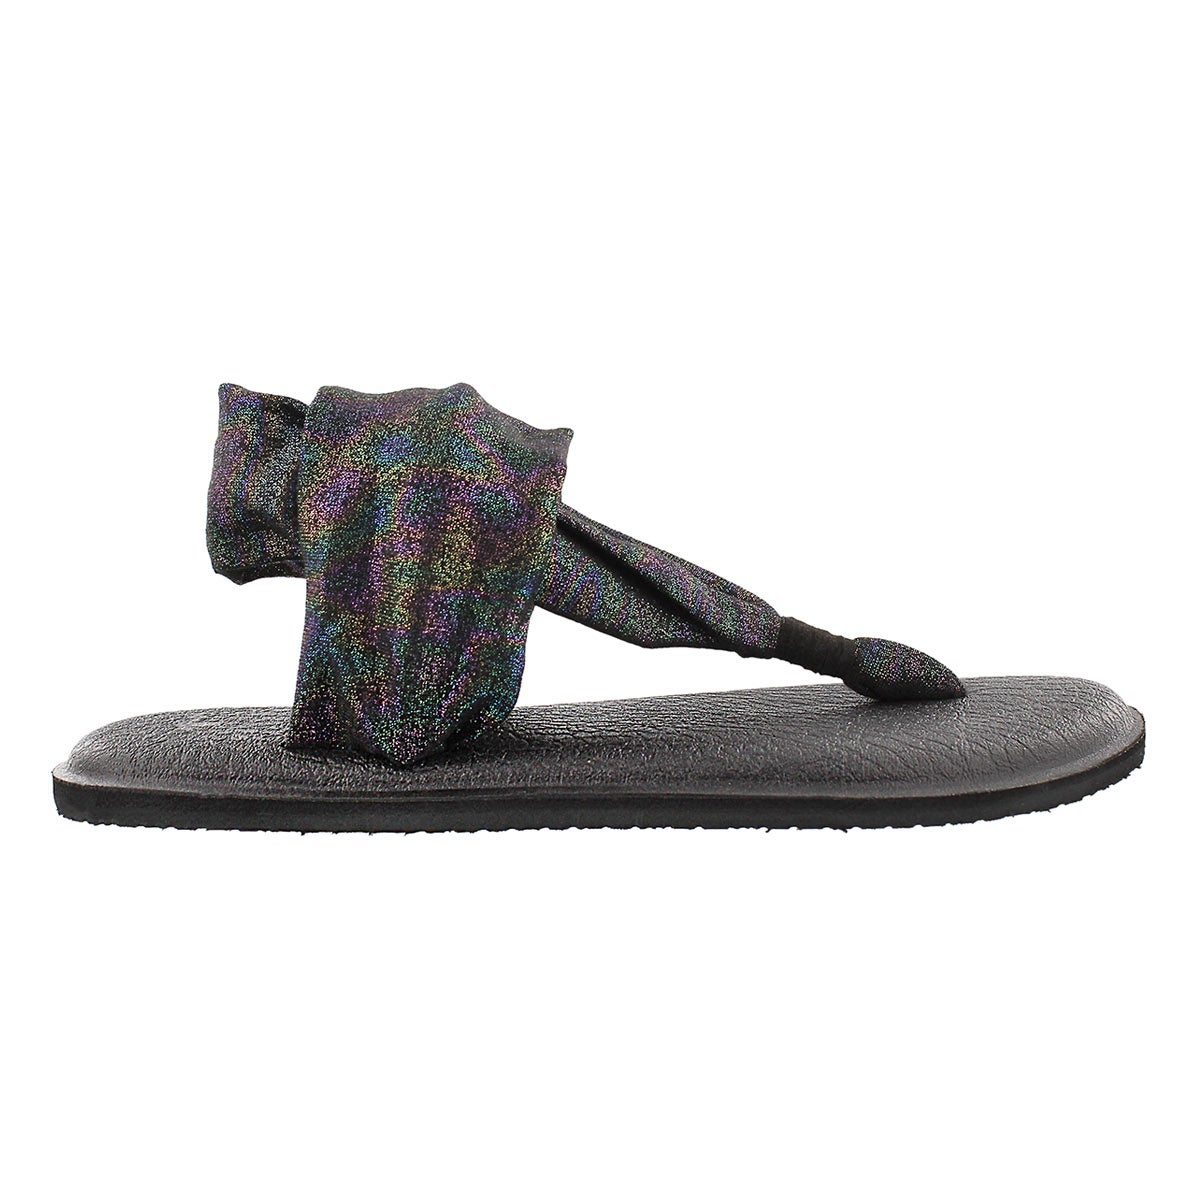 Lds YogaSling blk rainbow metallic thong